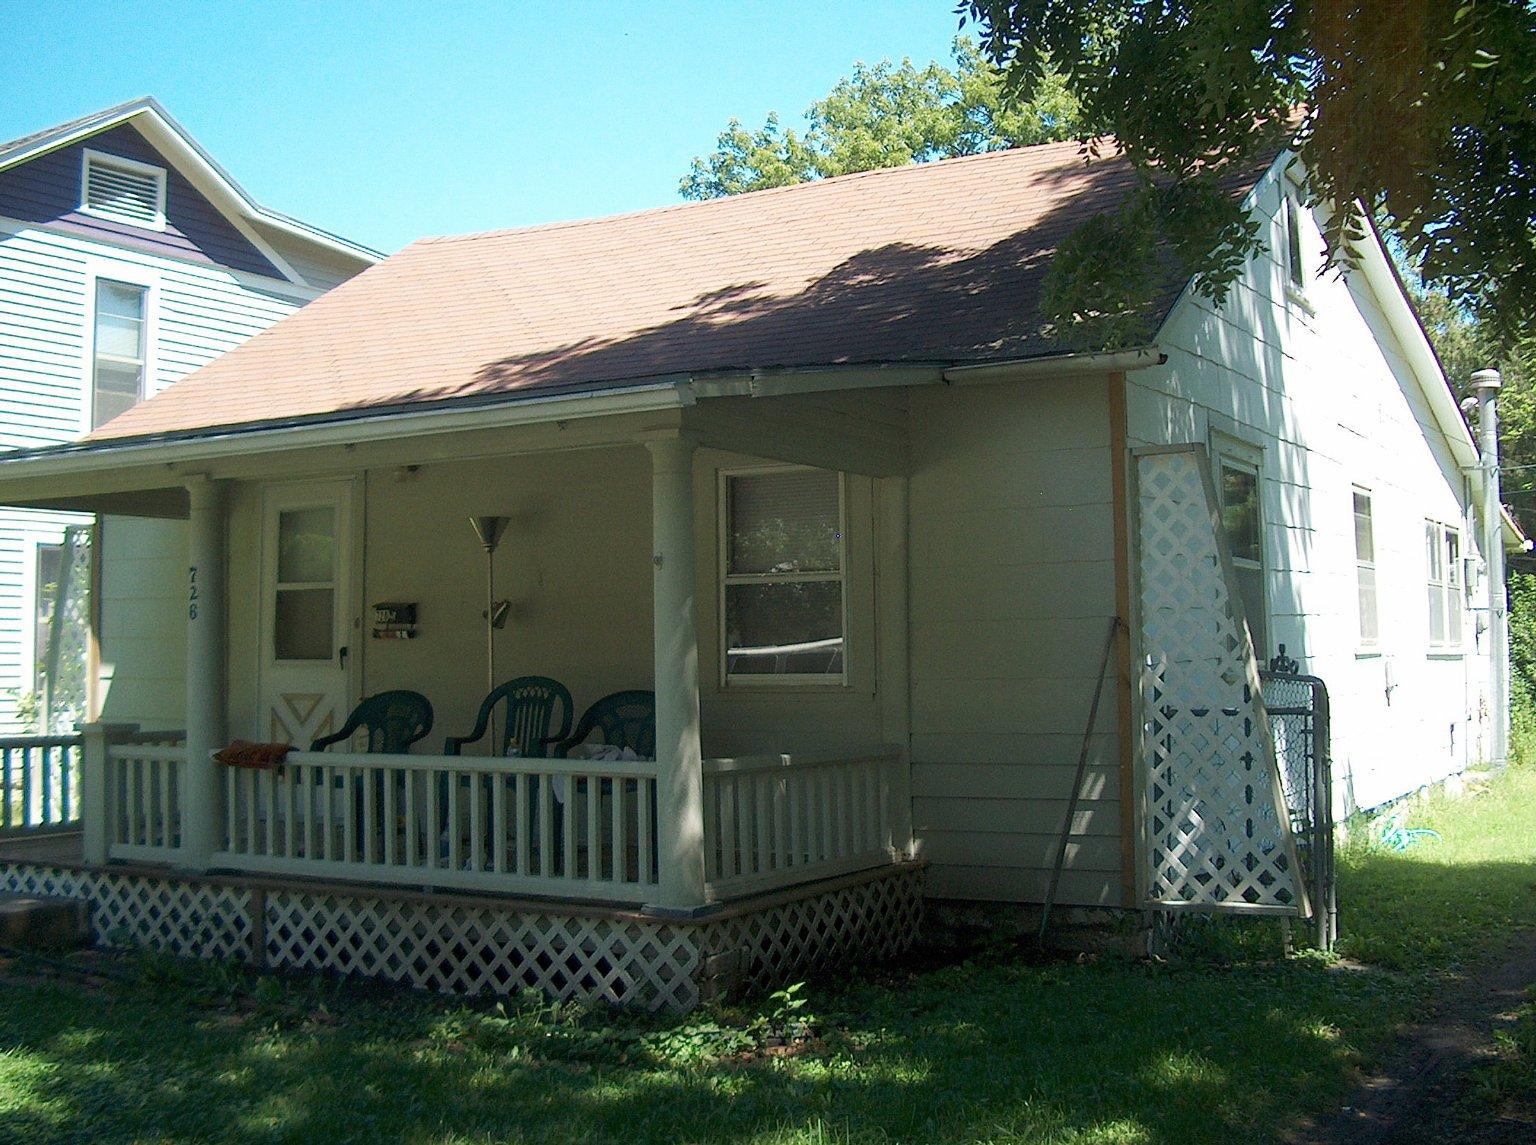 Home of Desaline W. Langston